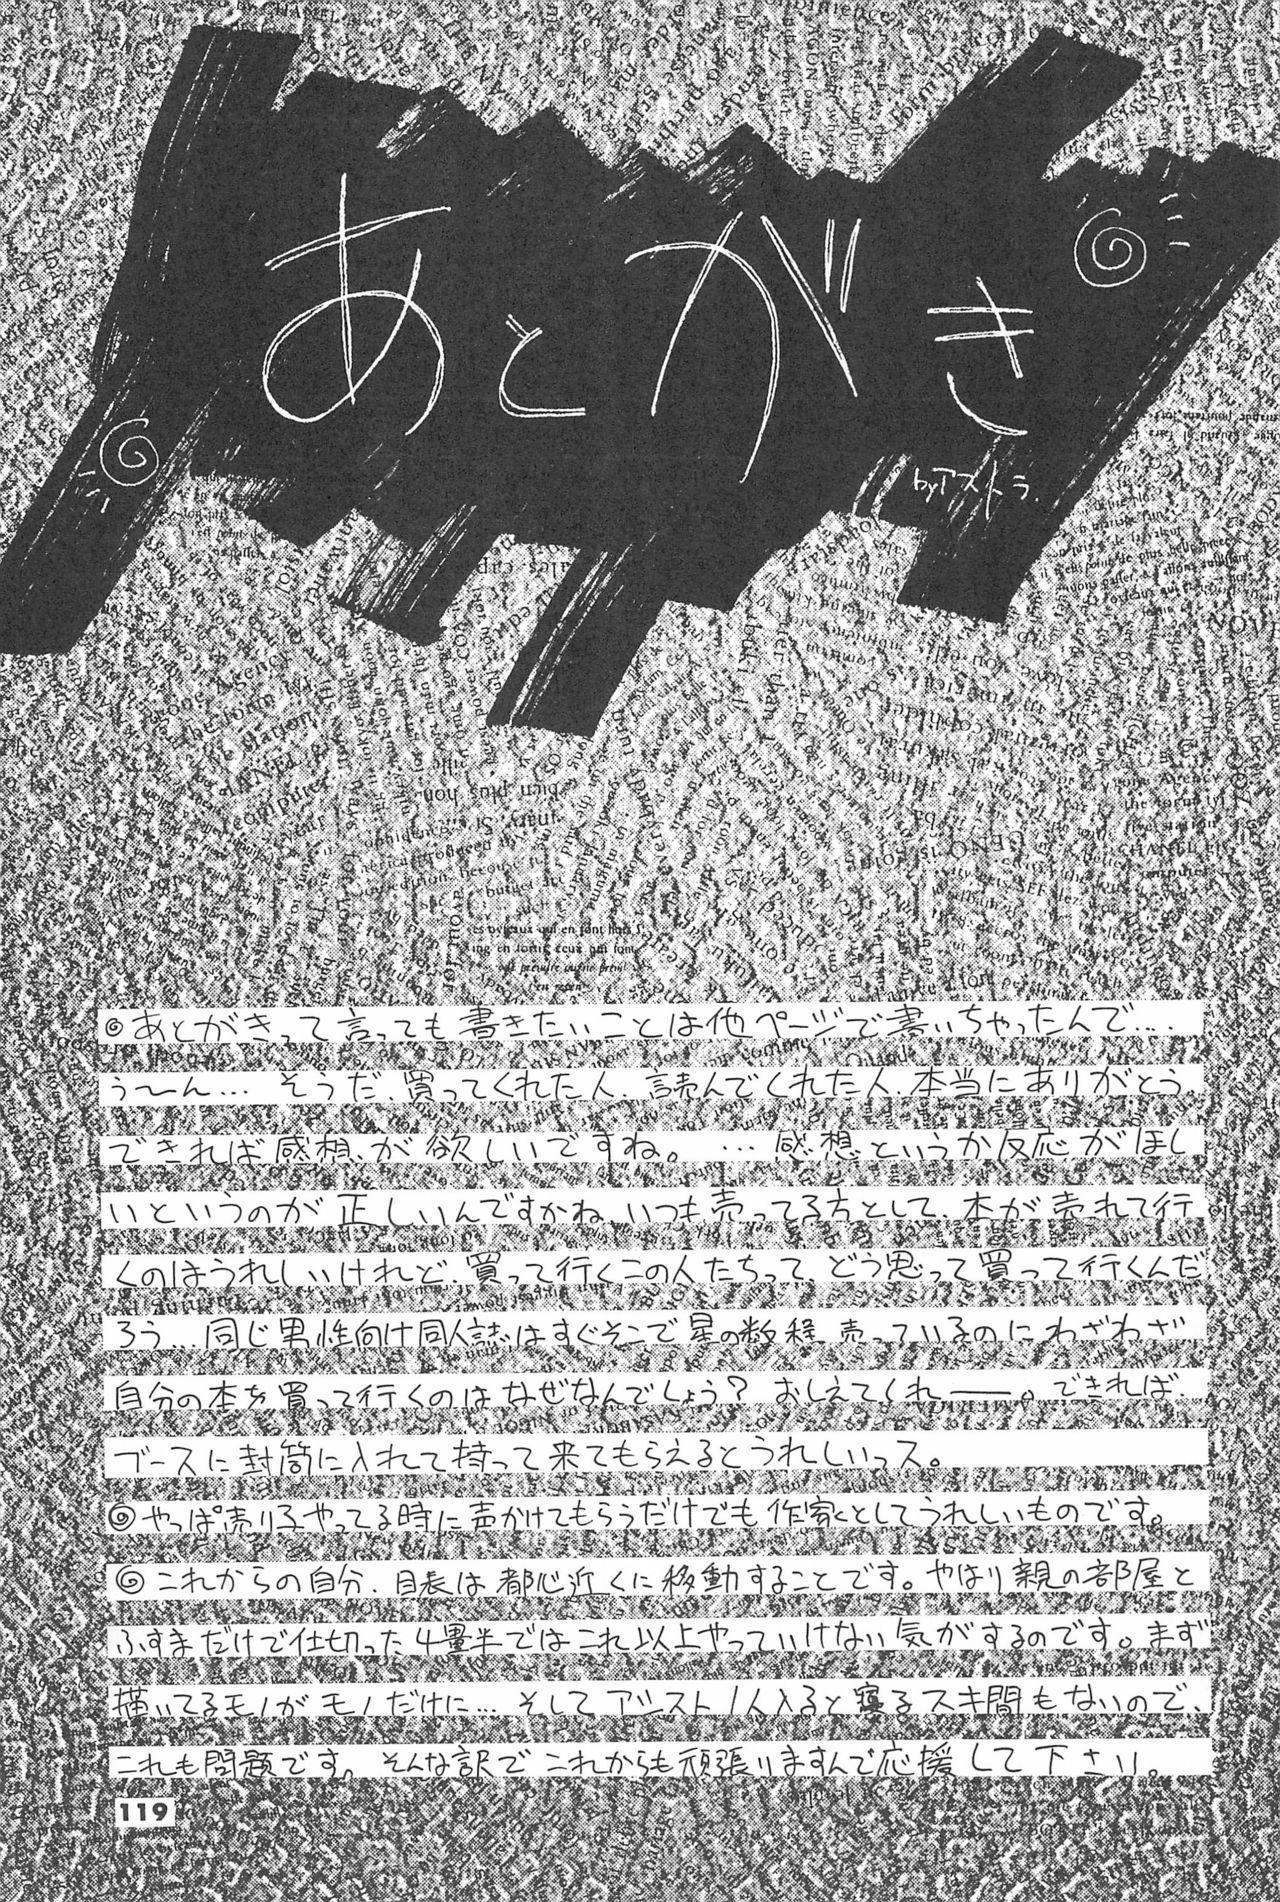 ASTRA NOAT 2 120